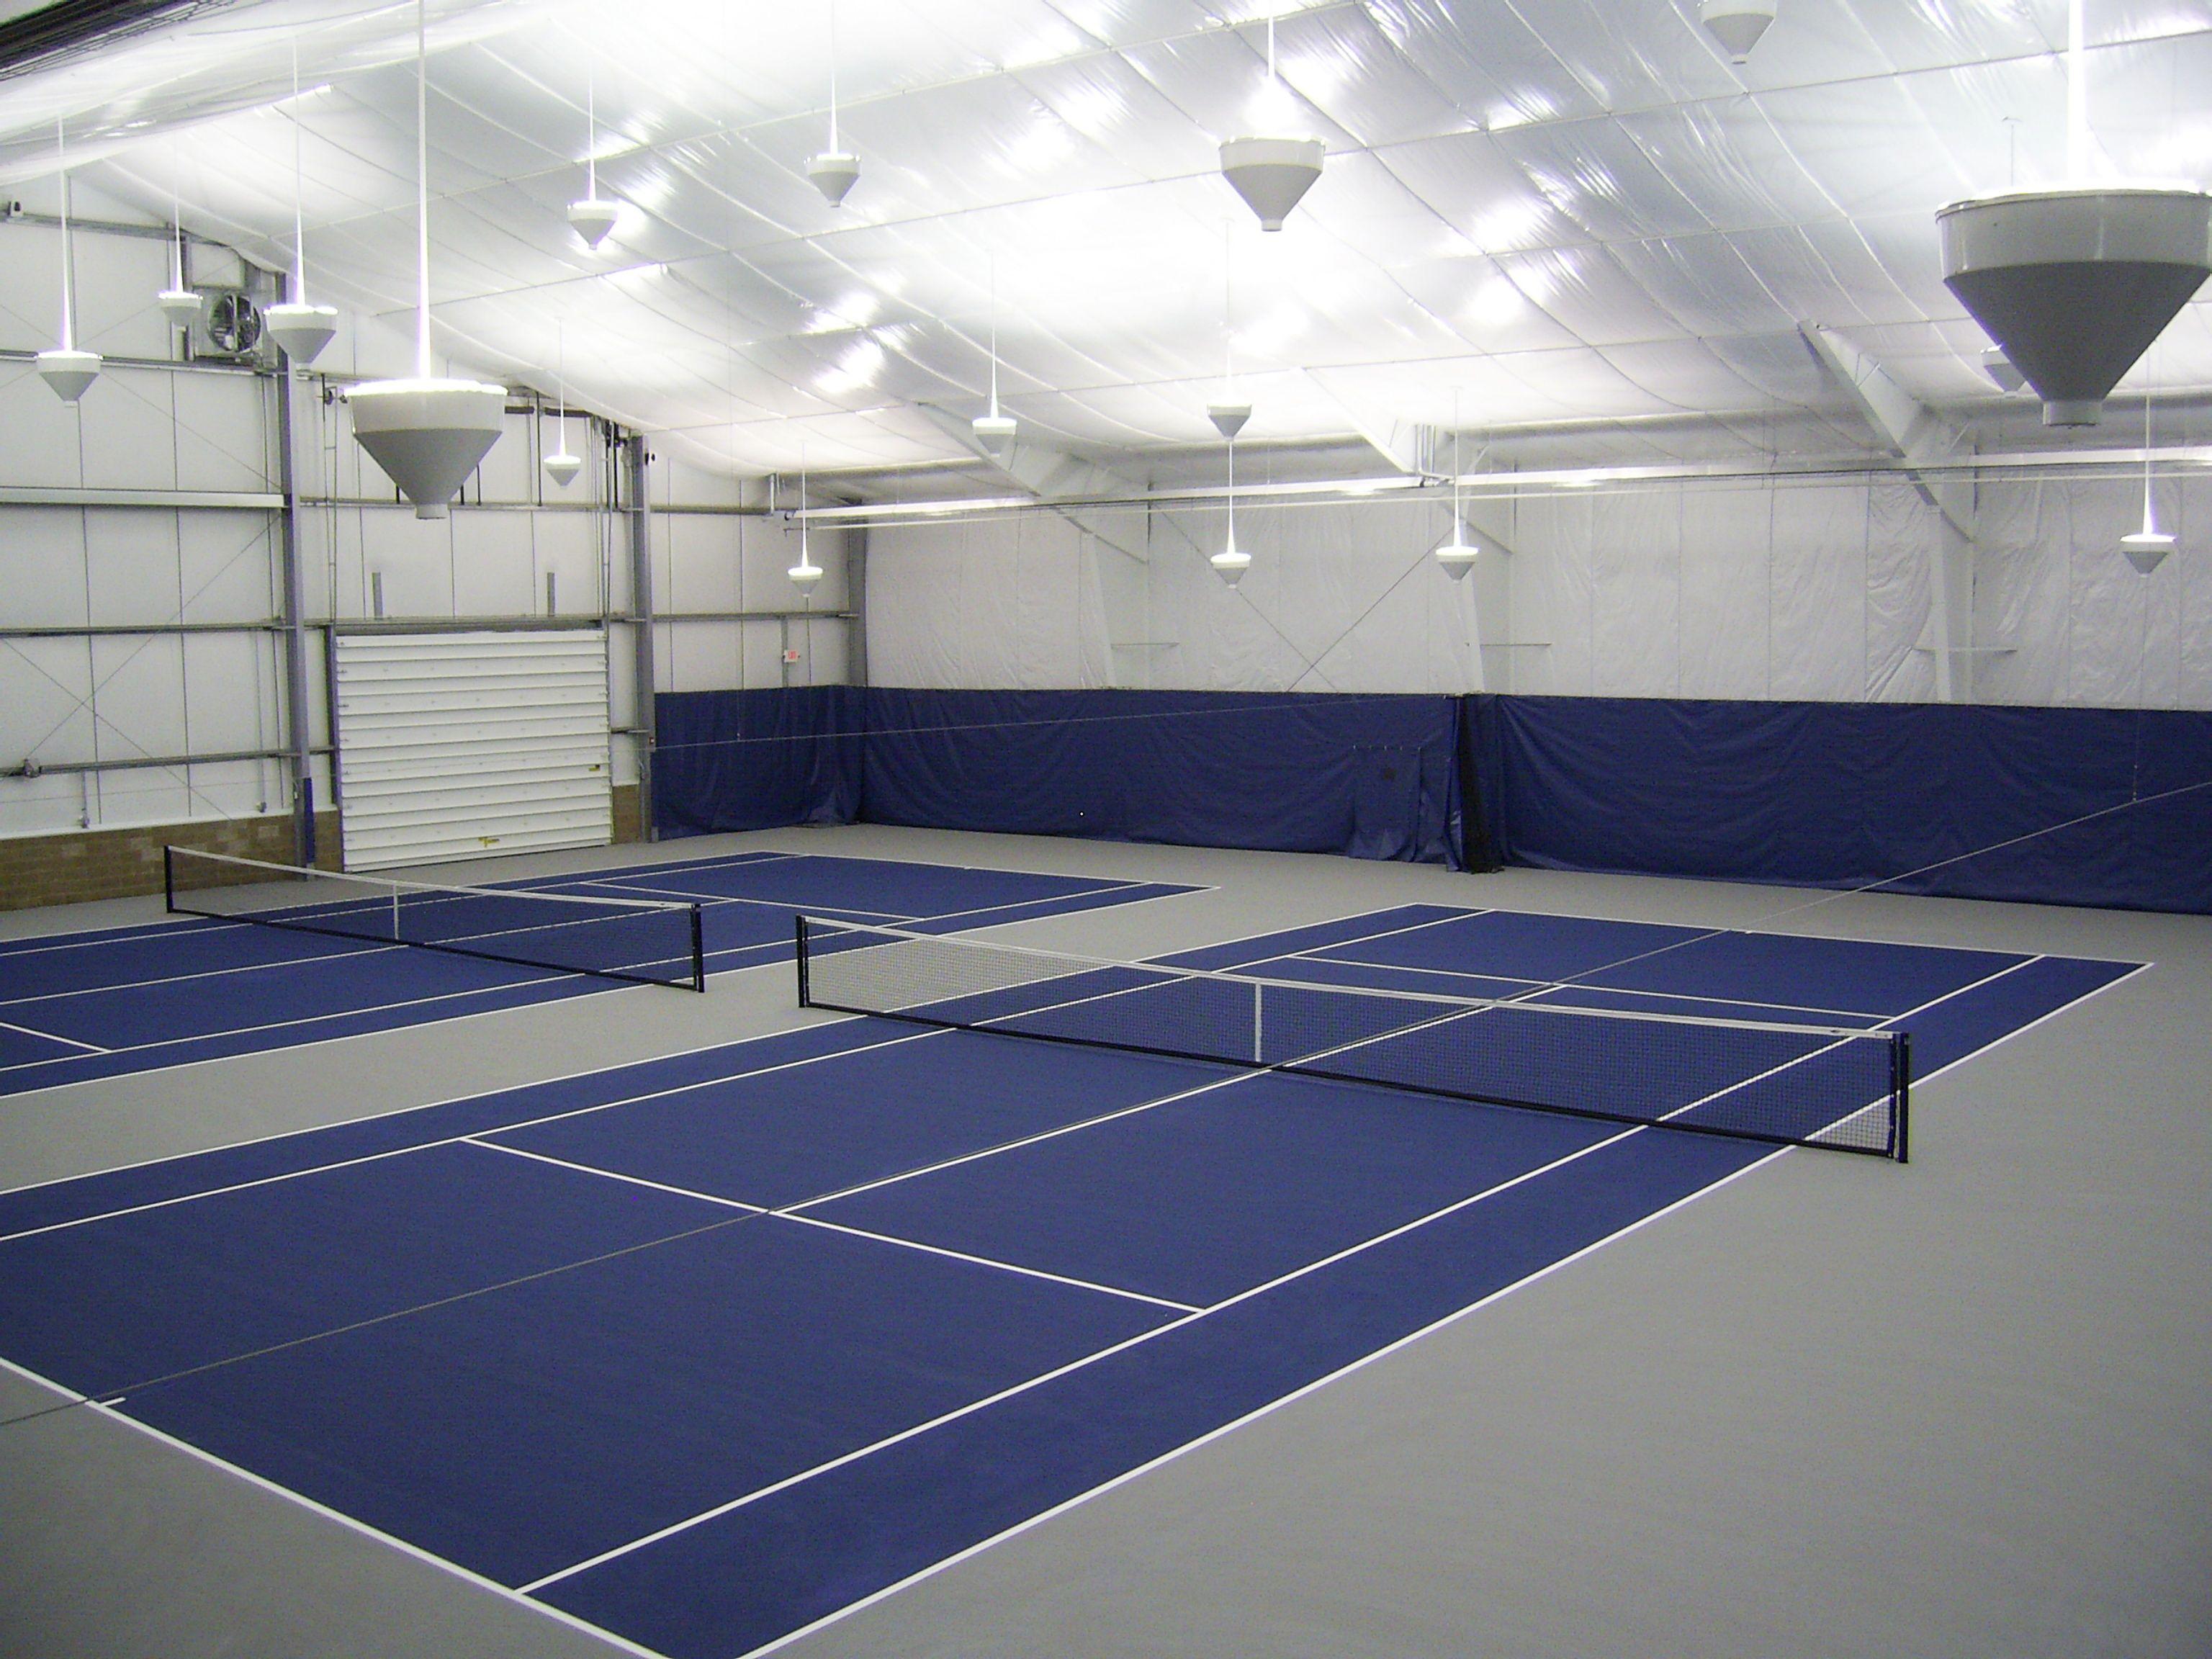 Towpath Tennis